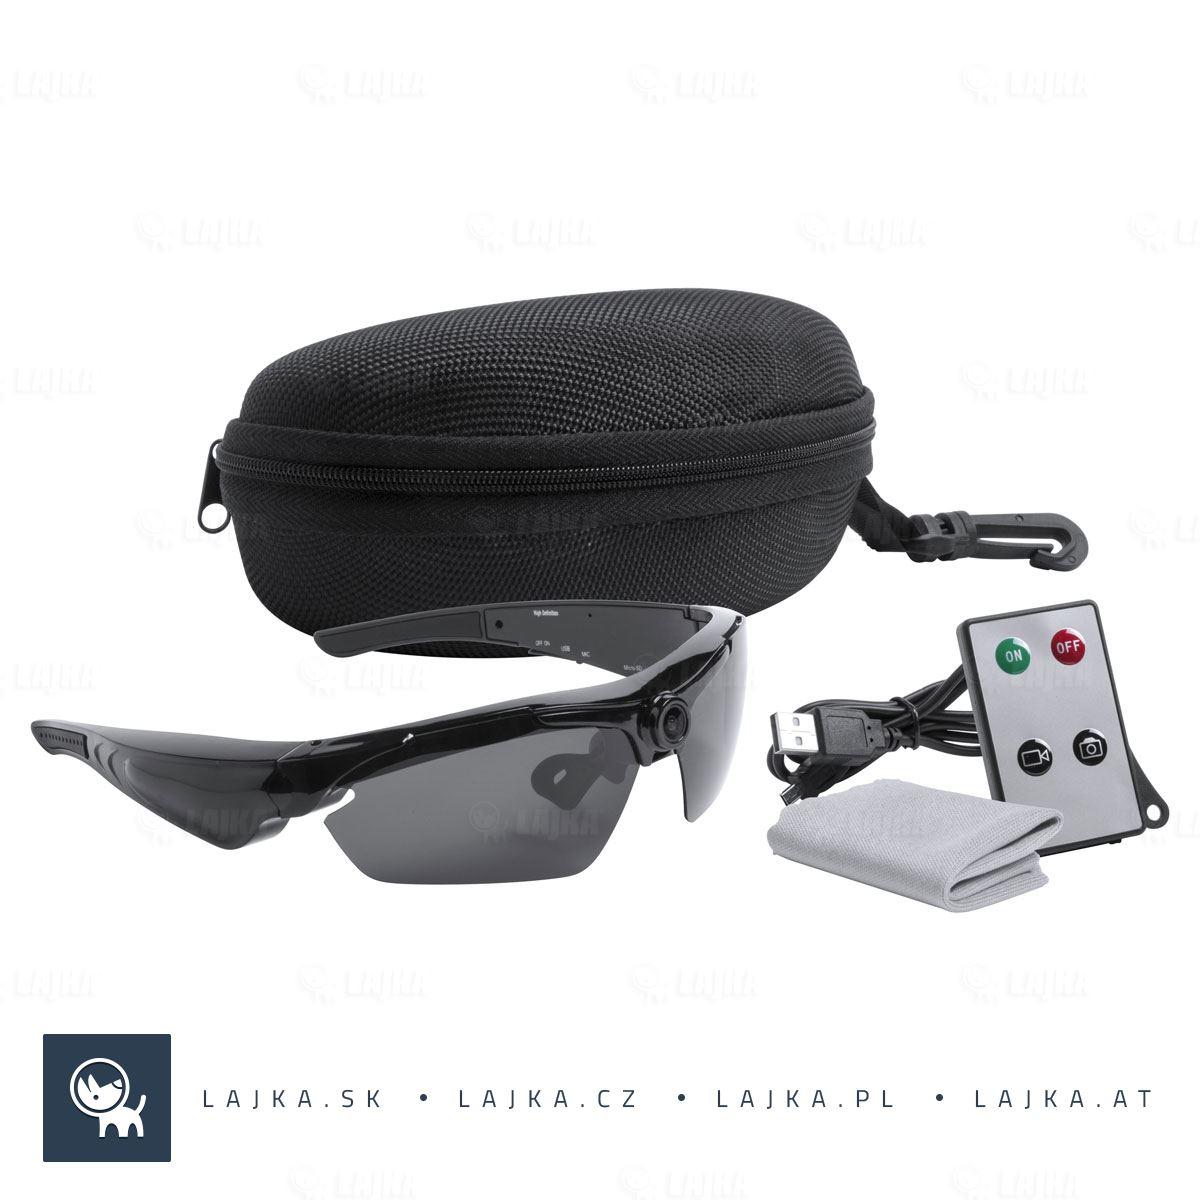 cfa63c37c Slnečné okuliare s kamerou Smith, čierna   LAJKA®